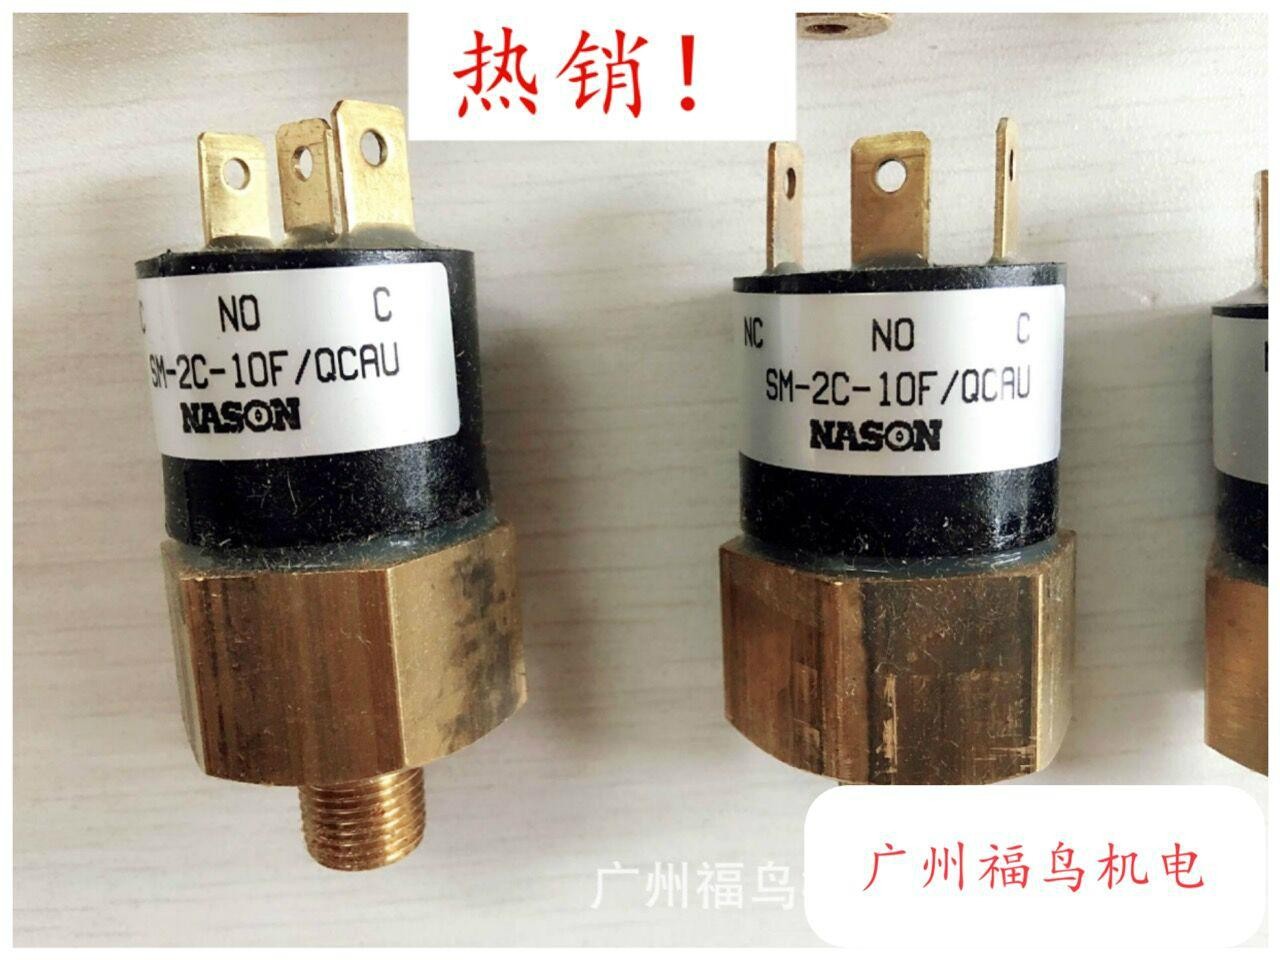 NASON壓力開關, 型號: SM-2C-10F/QCAU